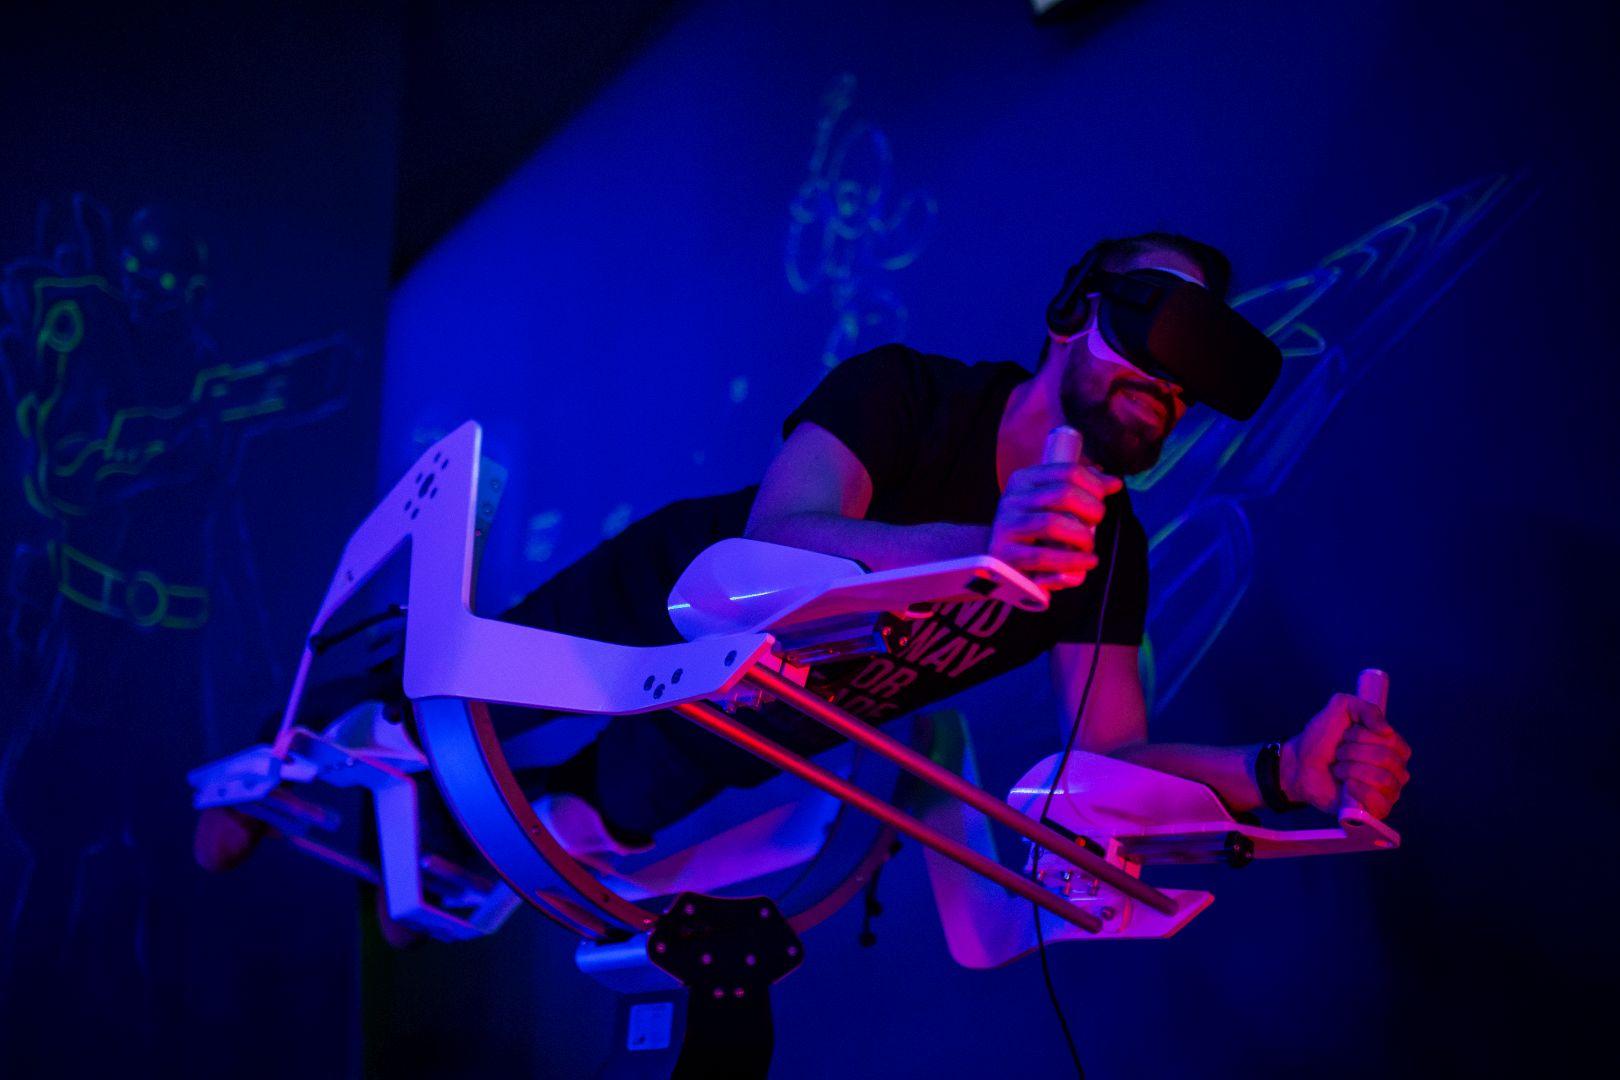 Icaros-fitness-VR-Virtual-Reality